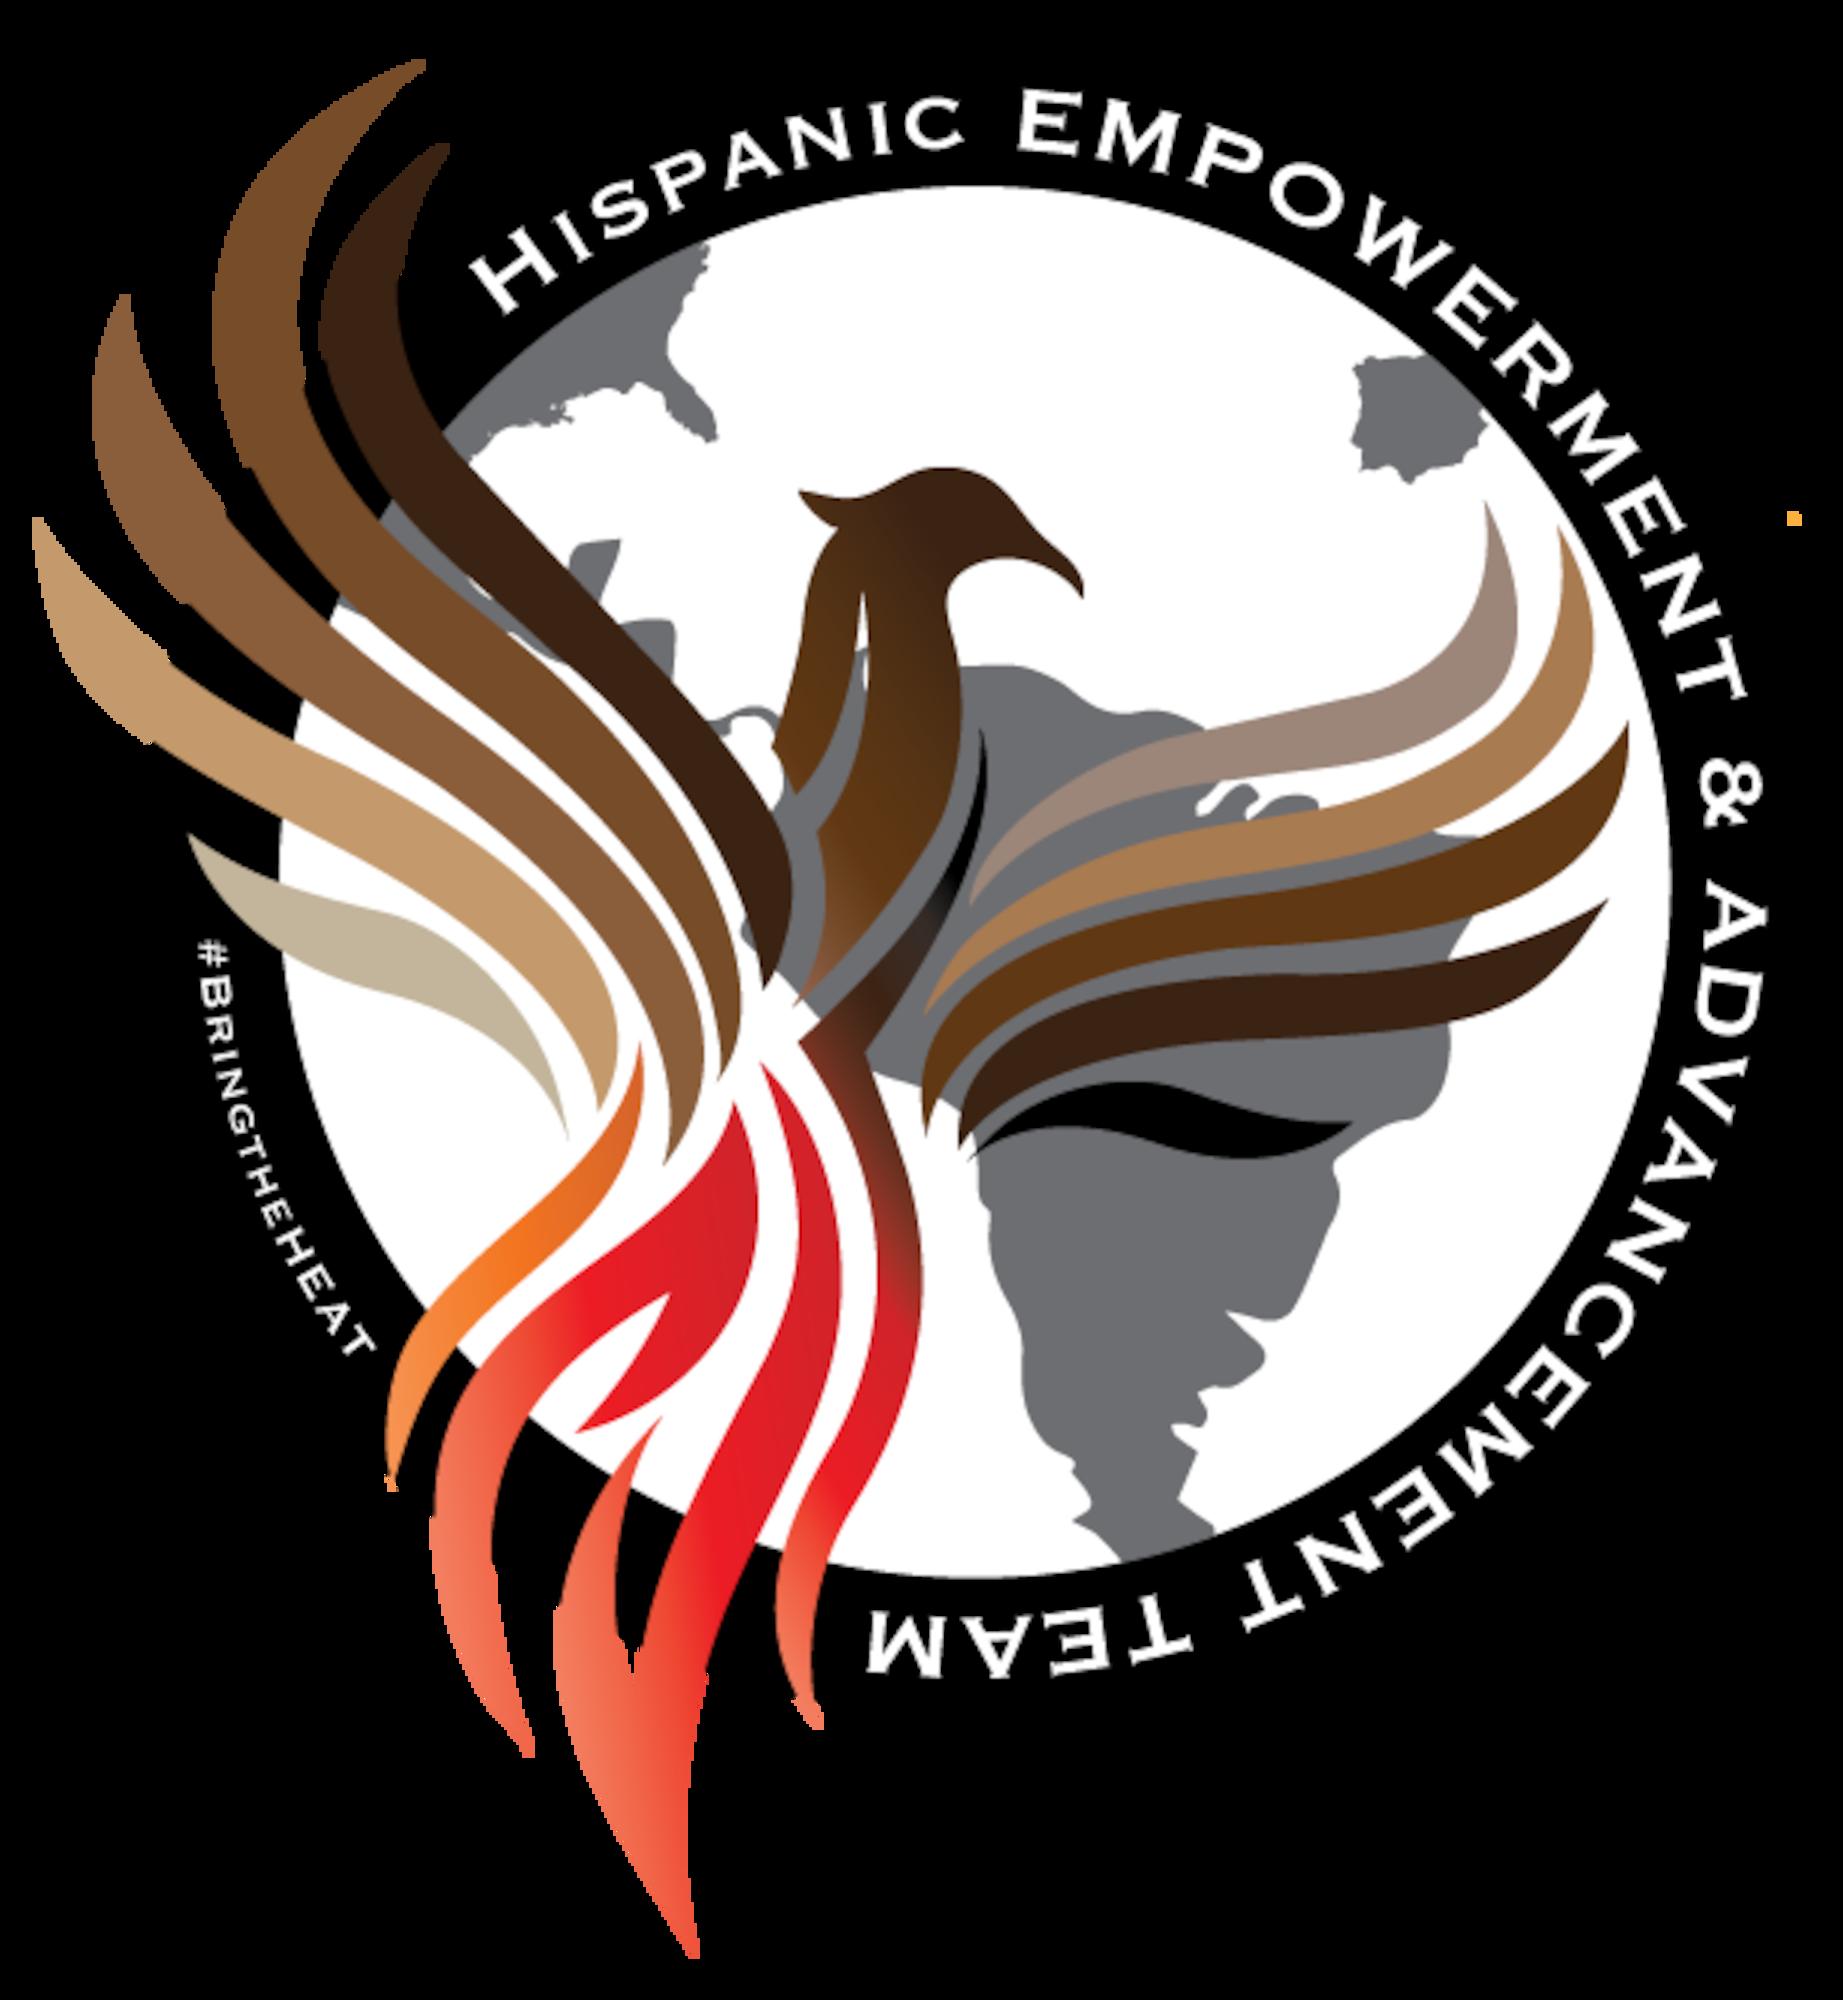 Hispanic Empowerment and Advancement Team logo.